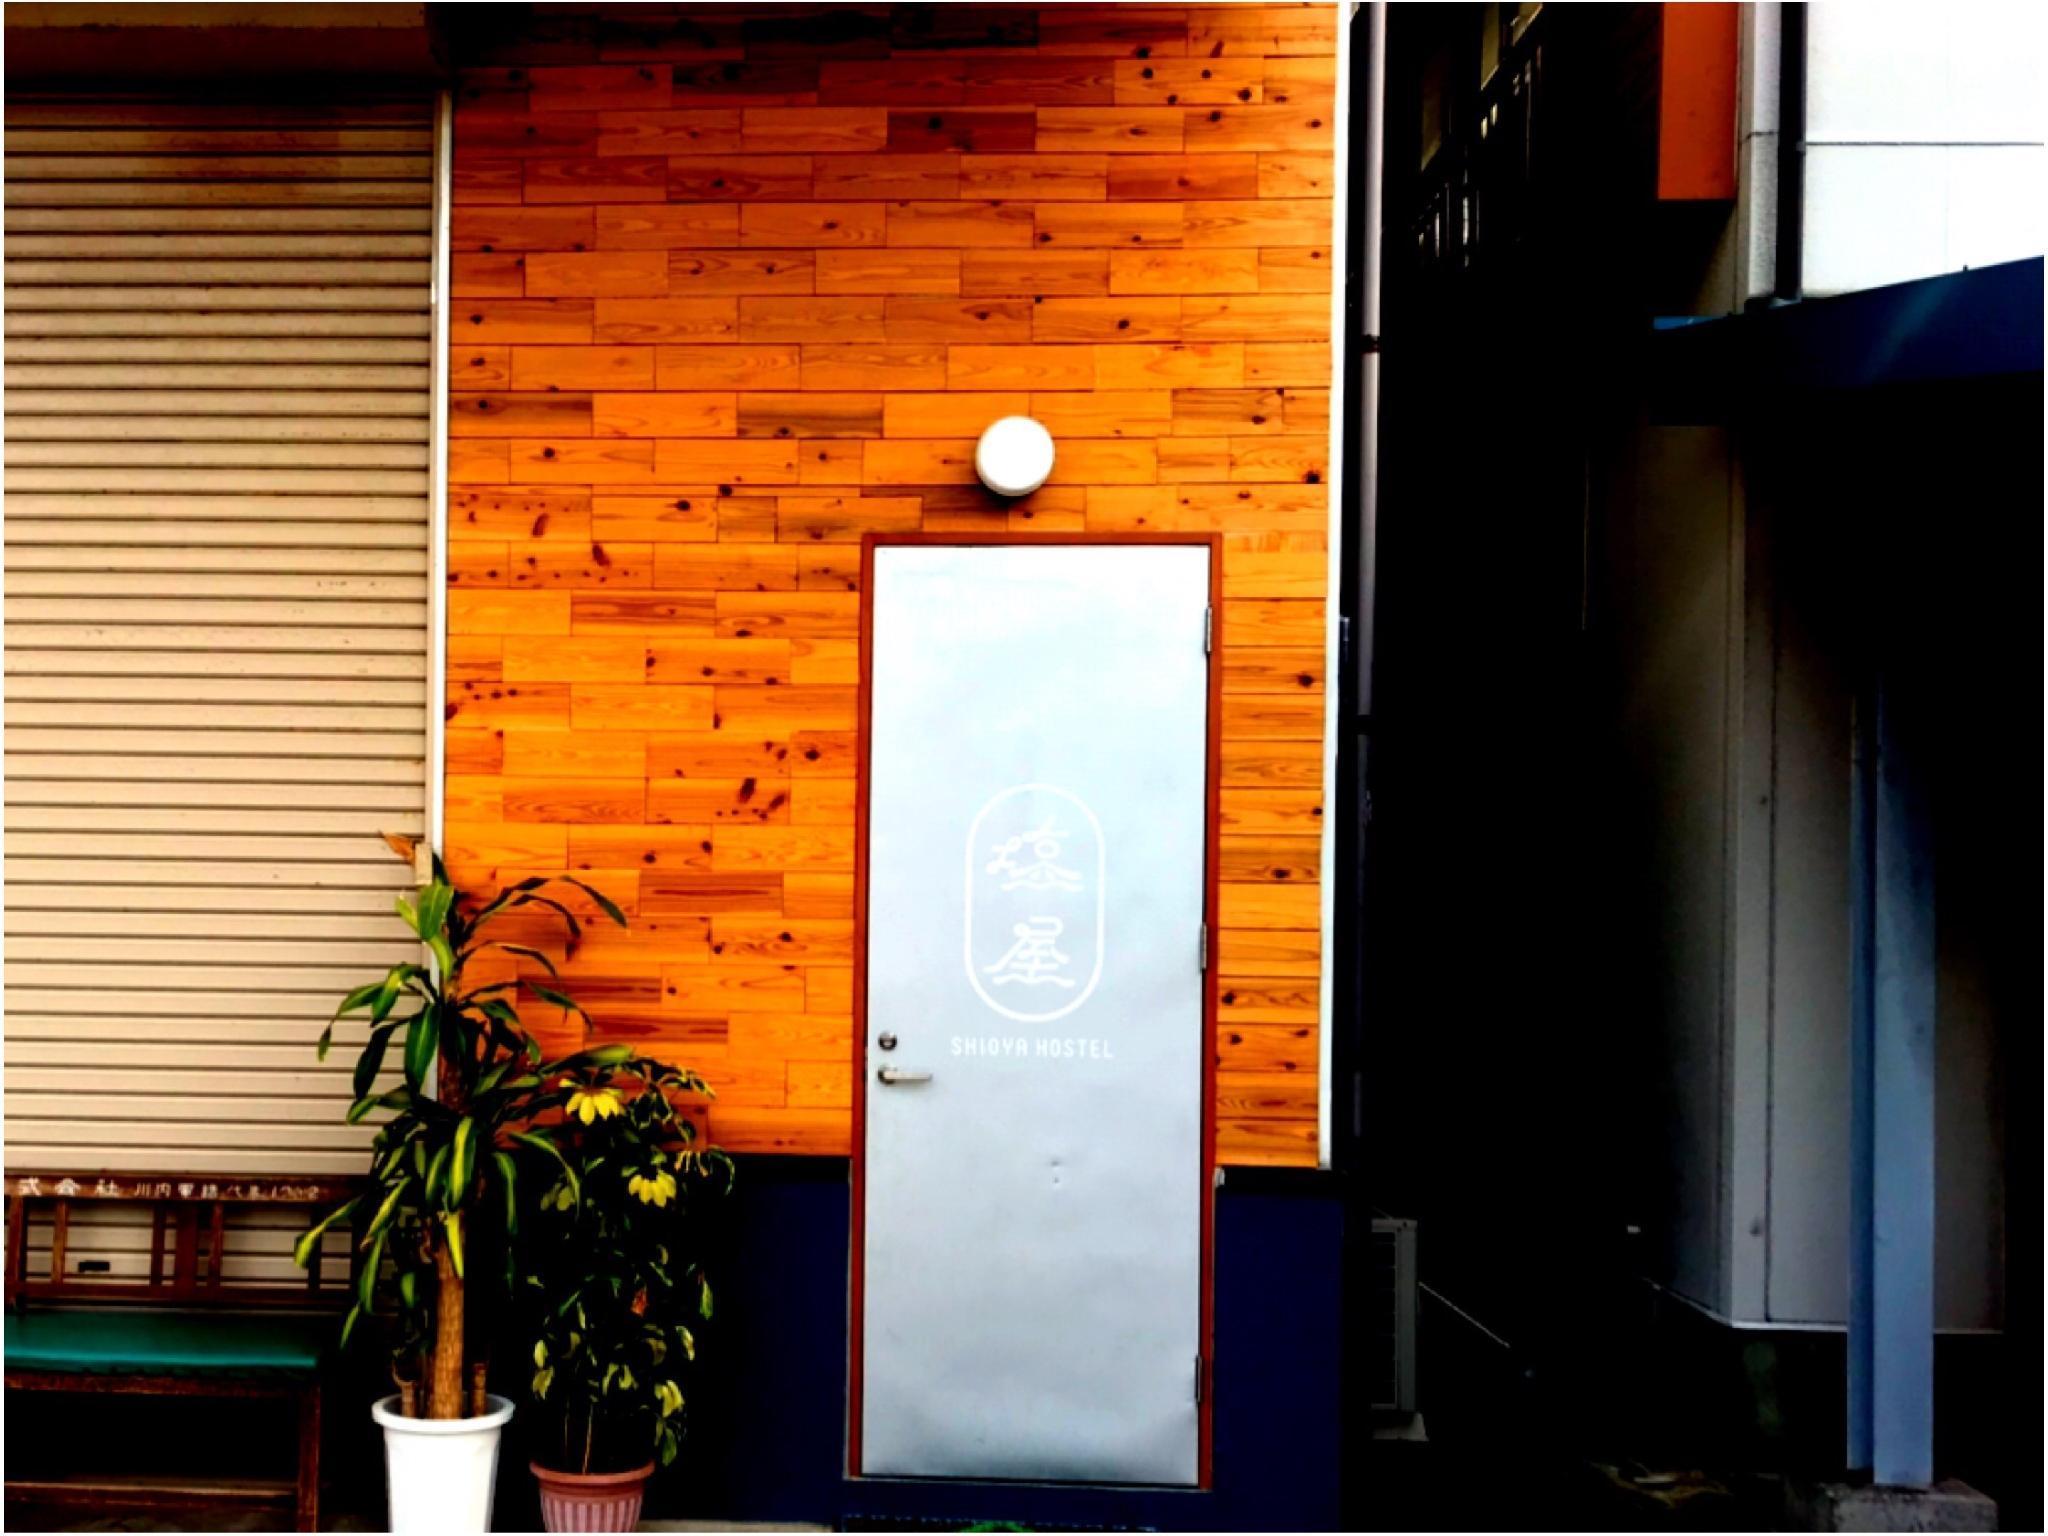 Shioya Hostel Akune